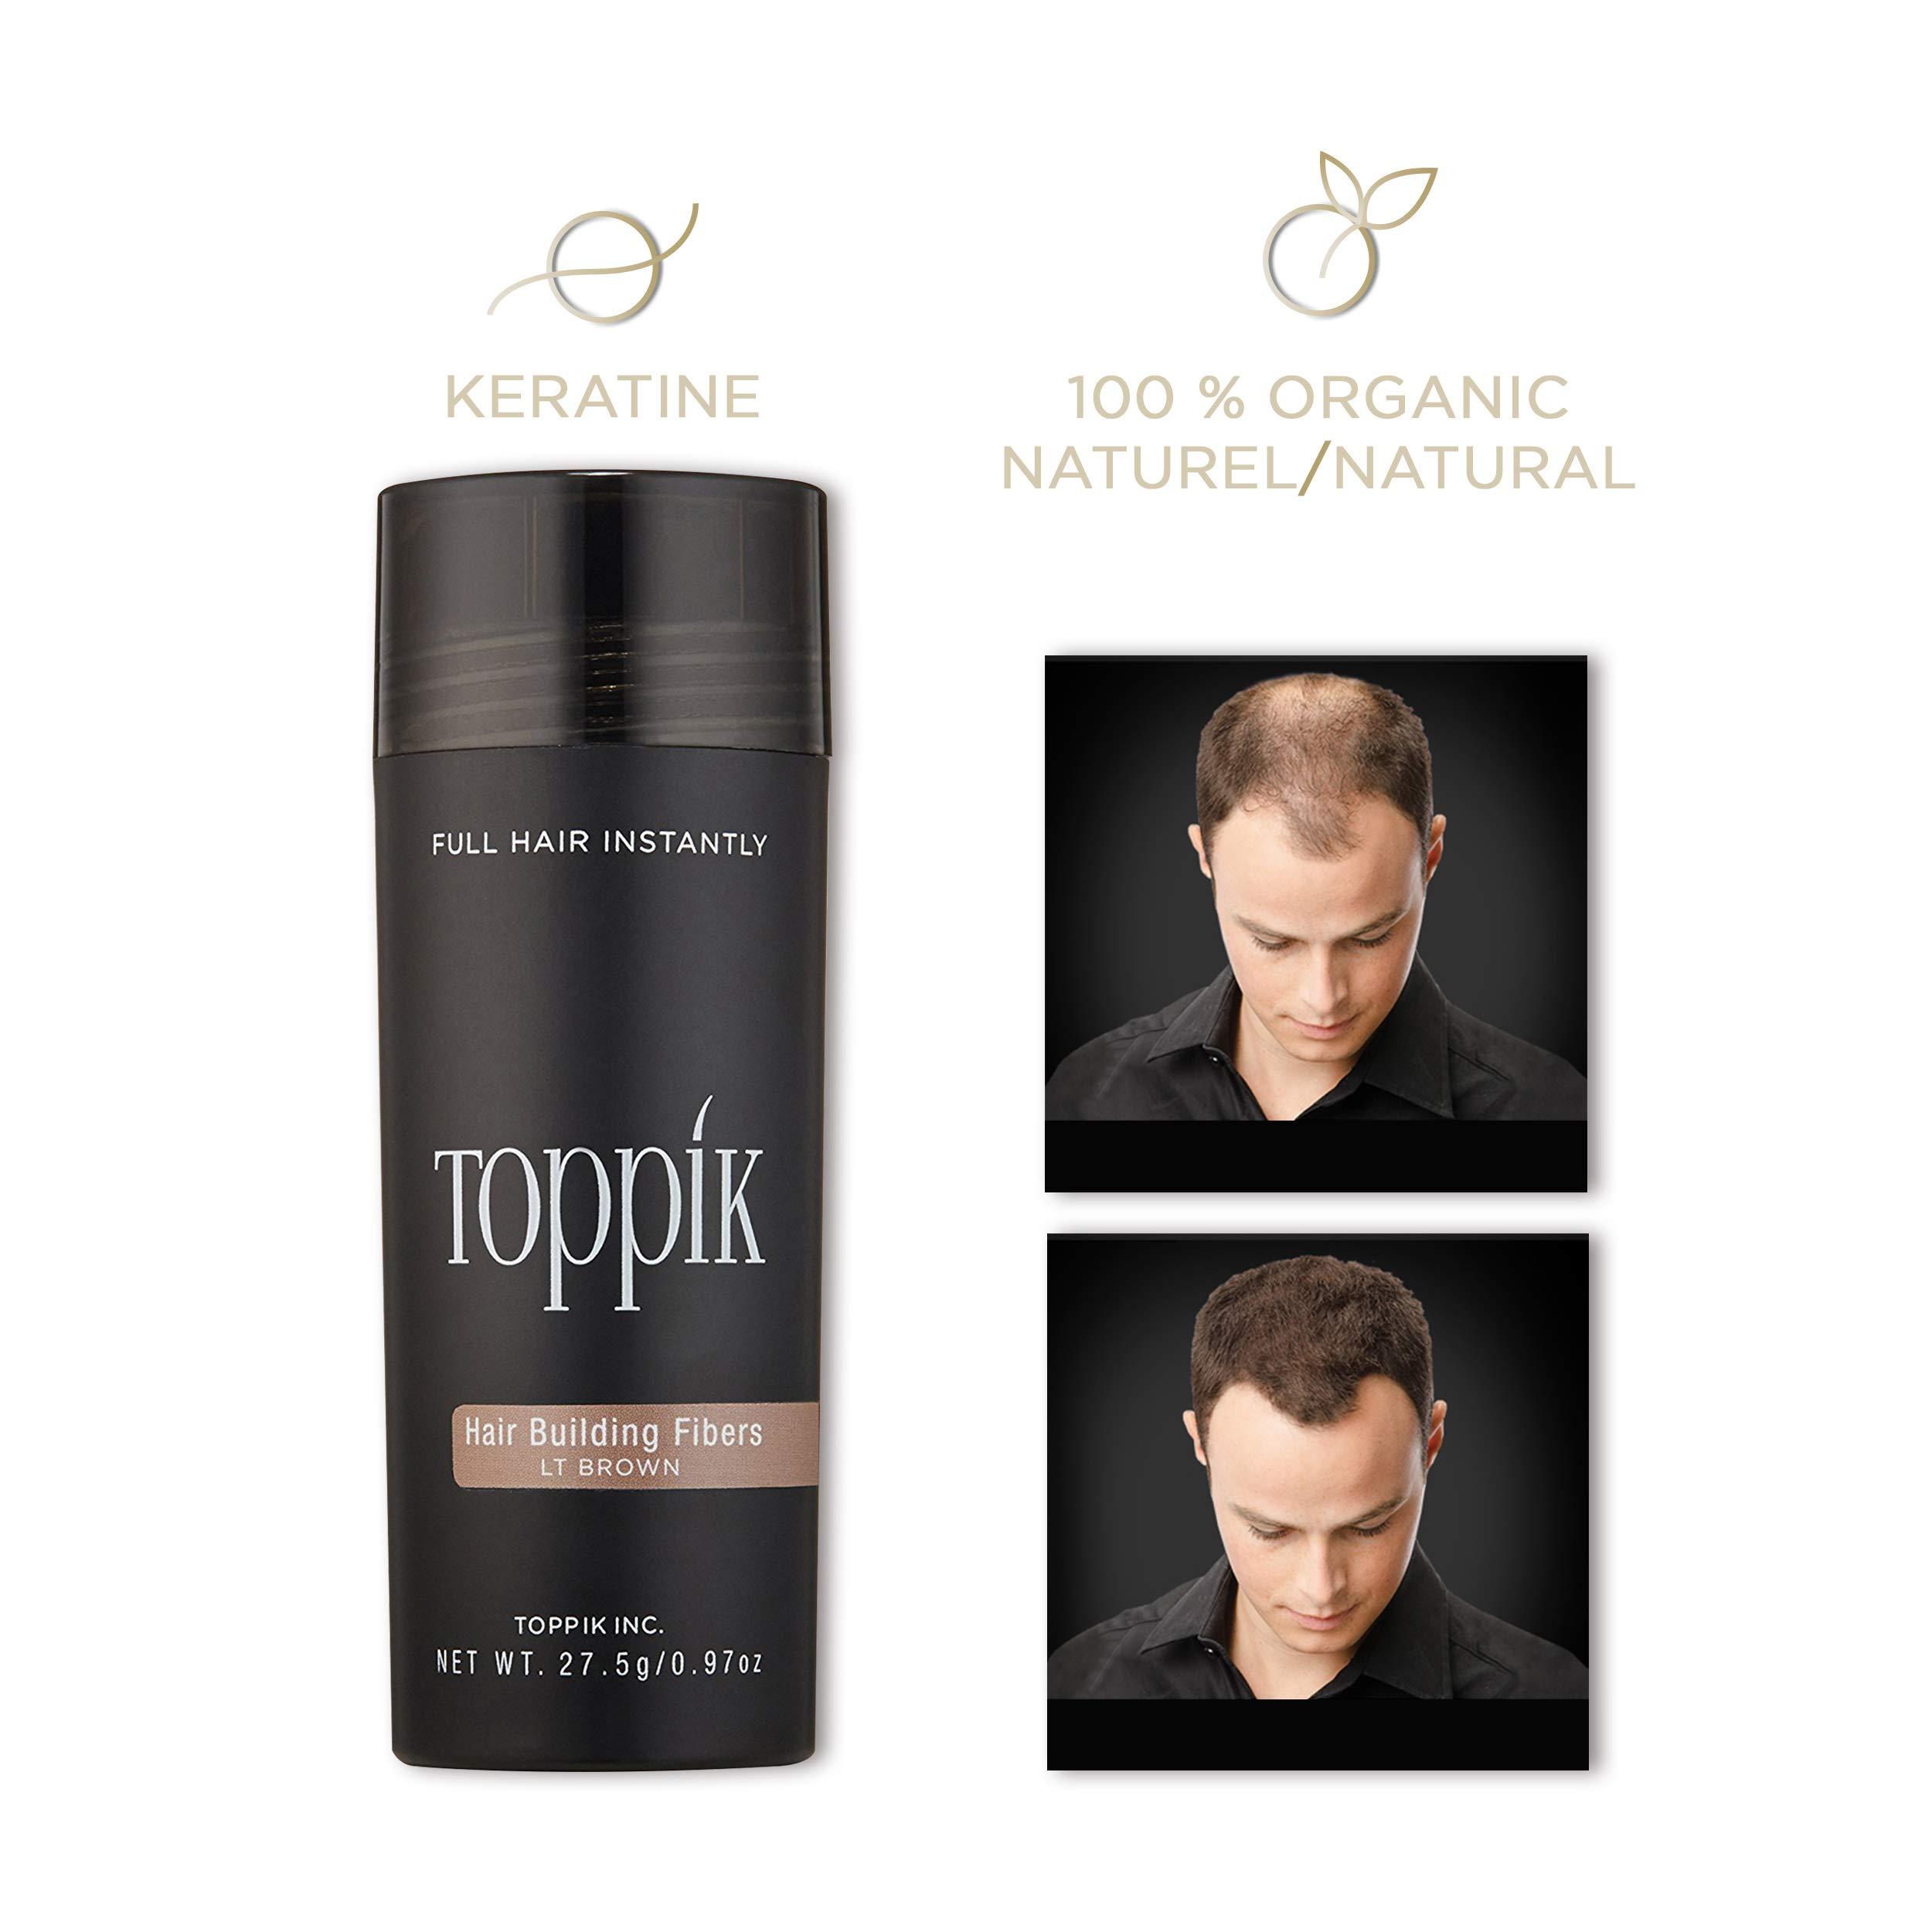 TOPPIK Hair Building Fibers, Light Brown, 0.97 oz.